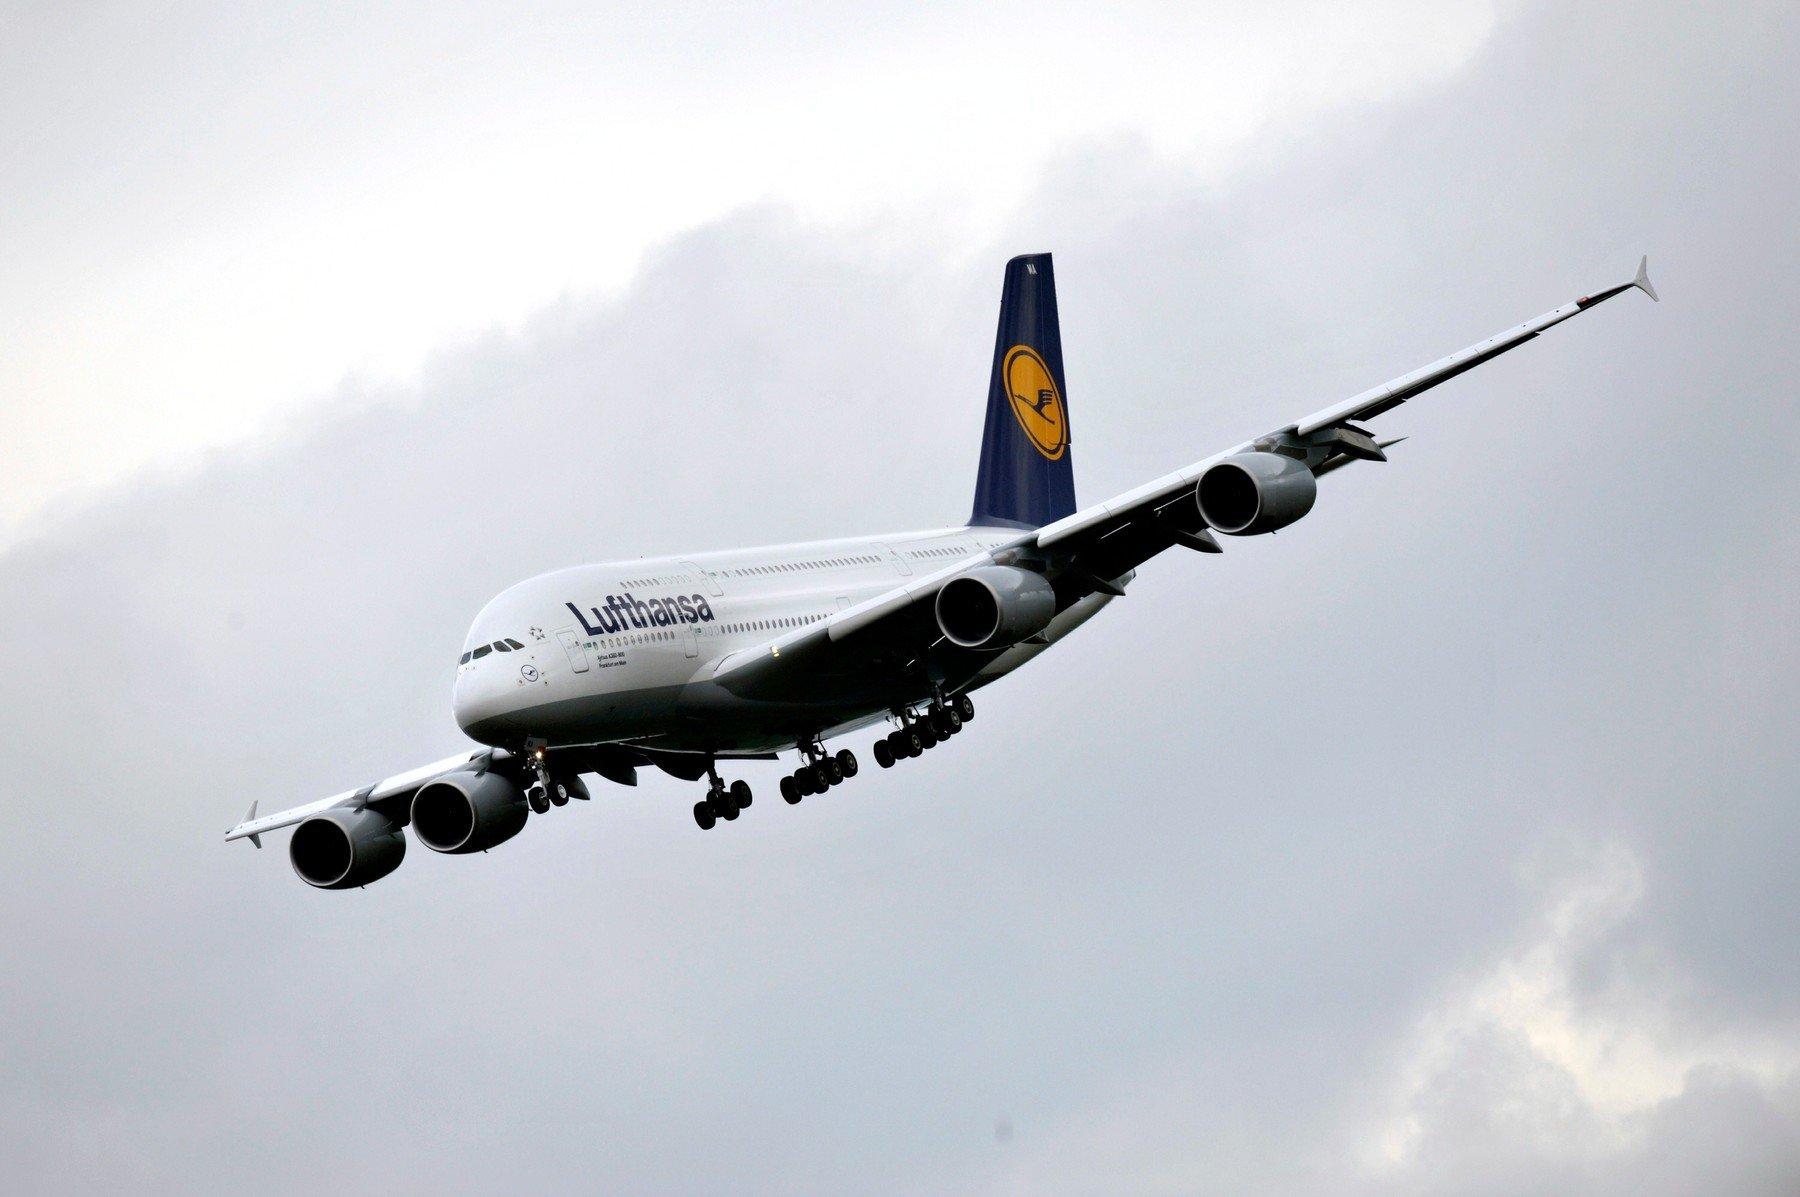 Lufthansin Airbus A380